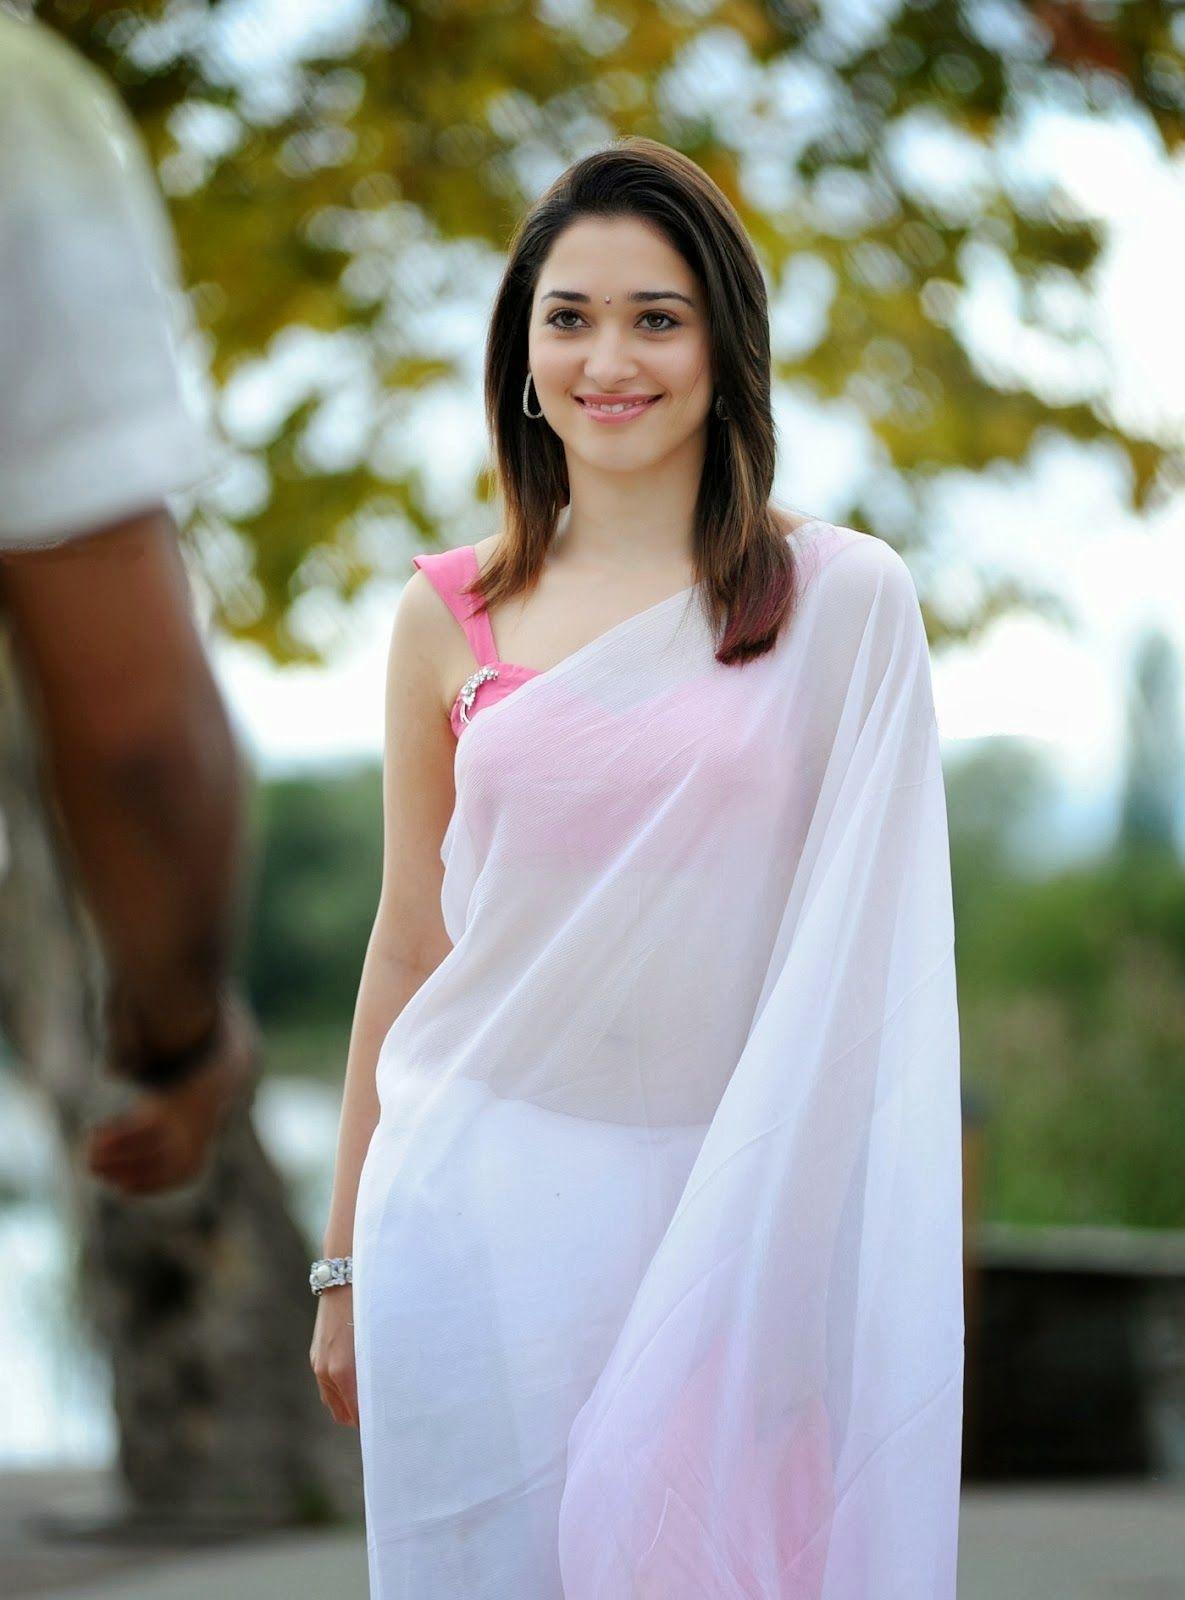 tamannaah+bhatia+images+in+white+saree+at+siima+awards+%286%29